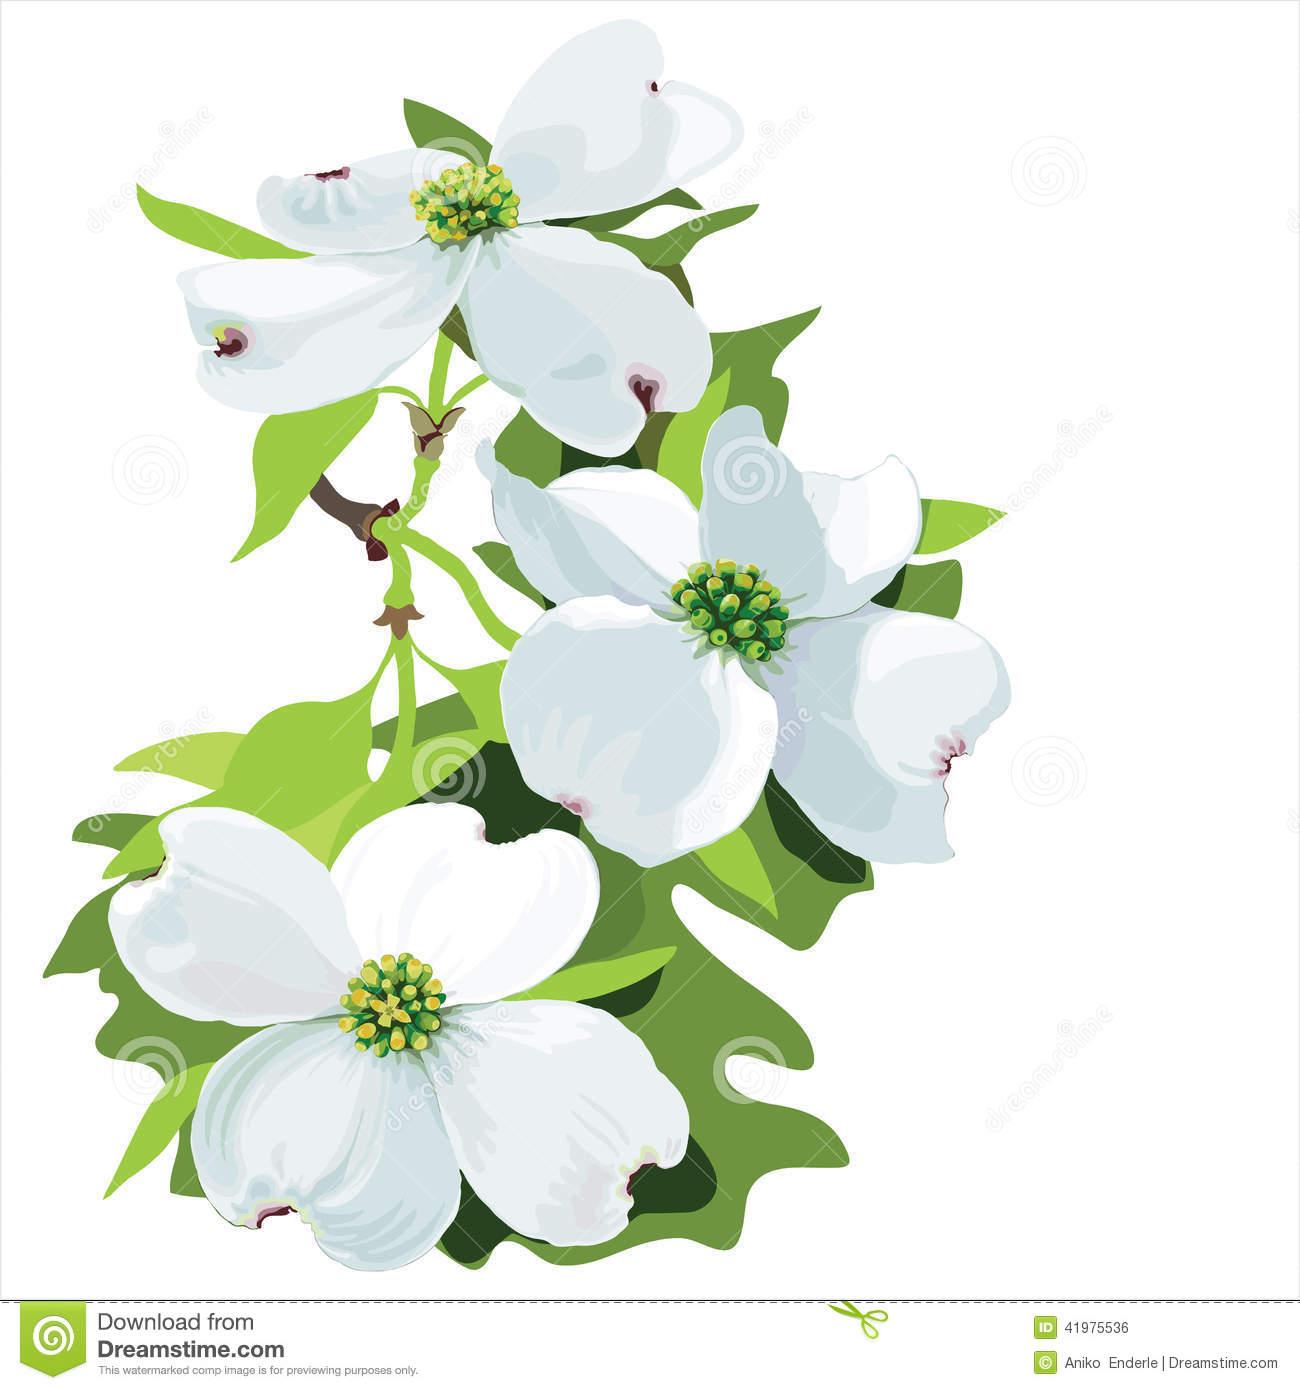 Cornus Blossom clipart #20, Download drawings